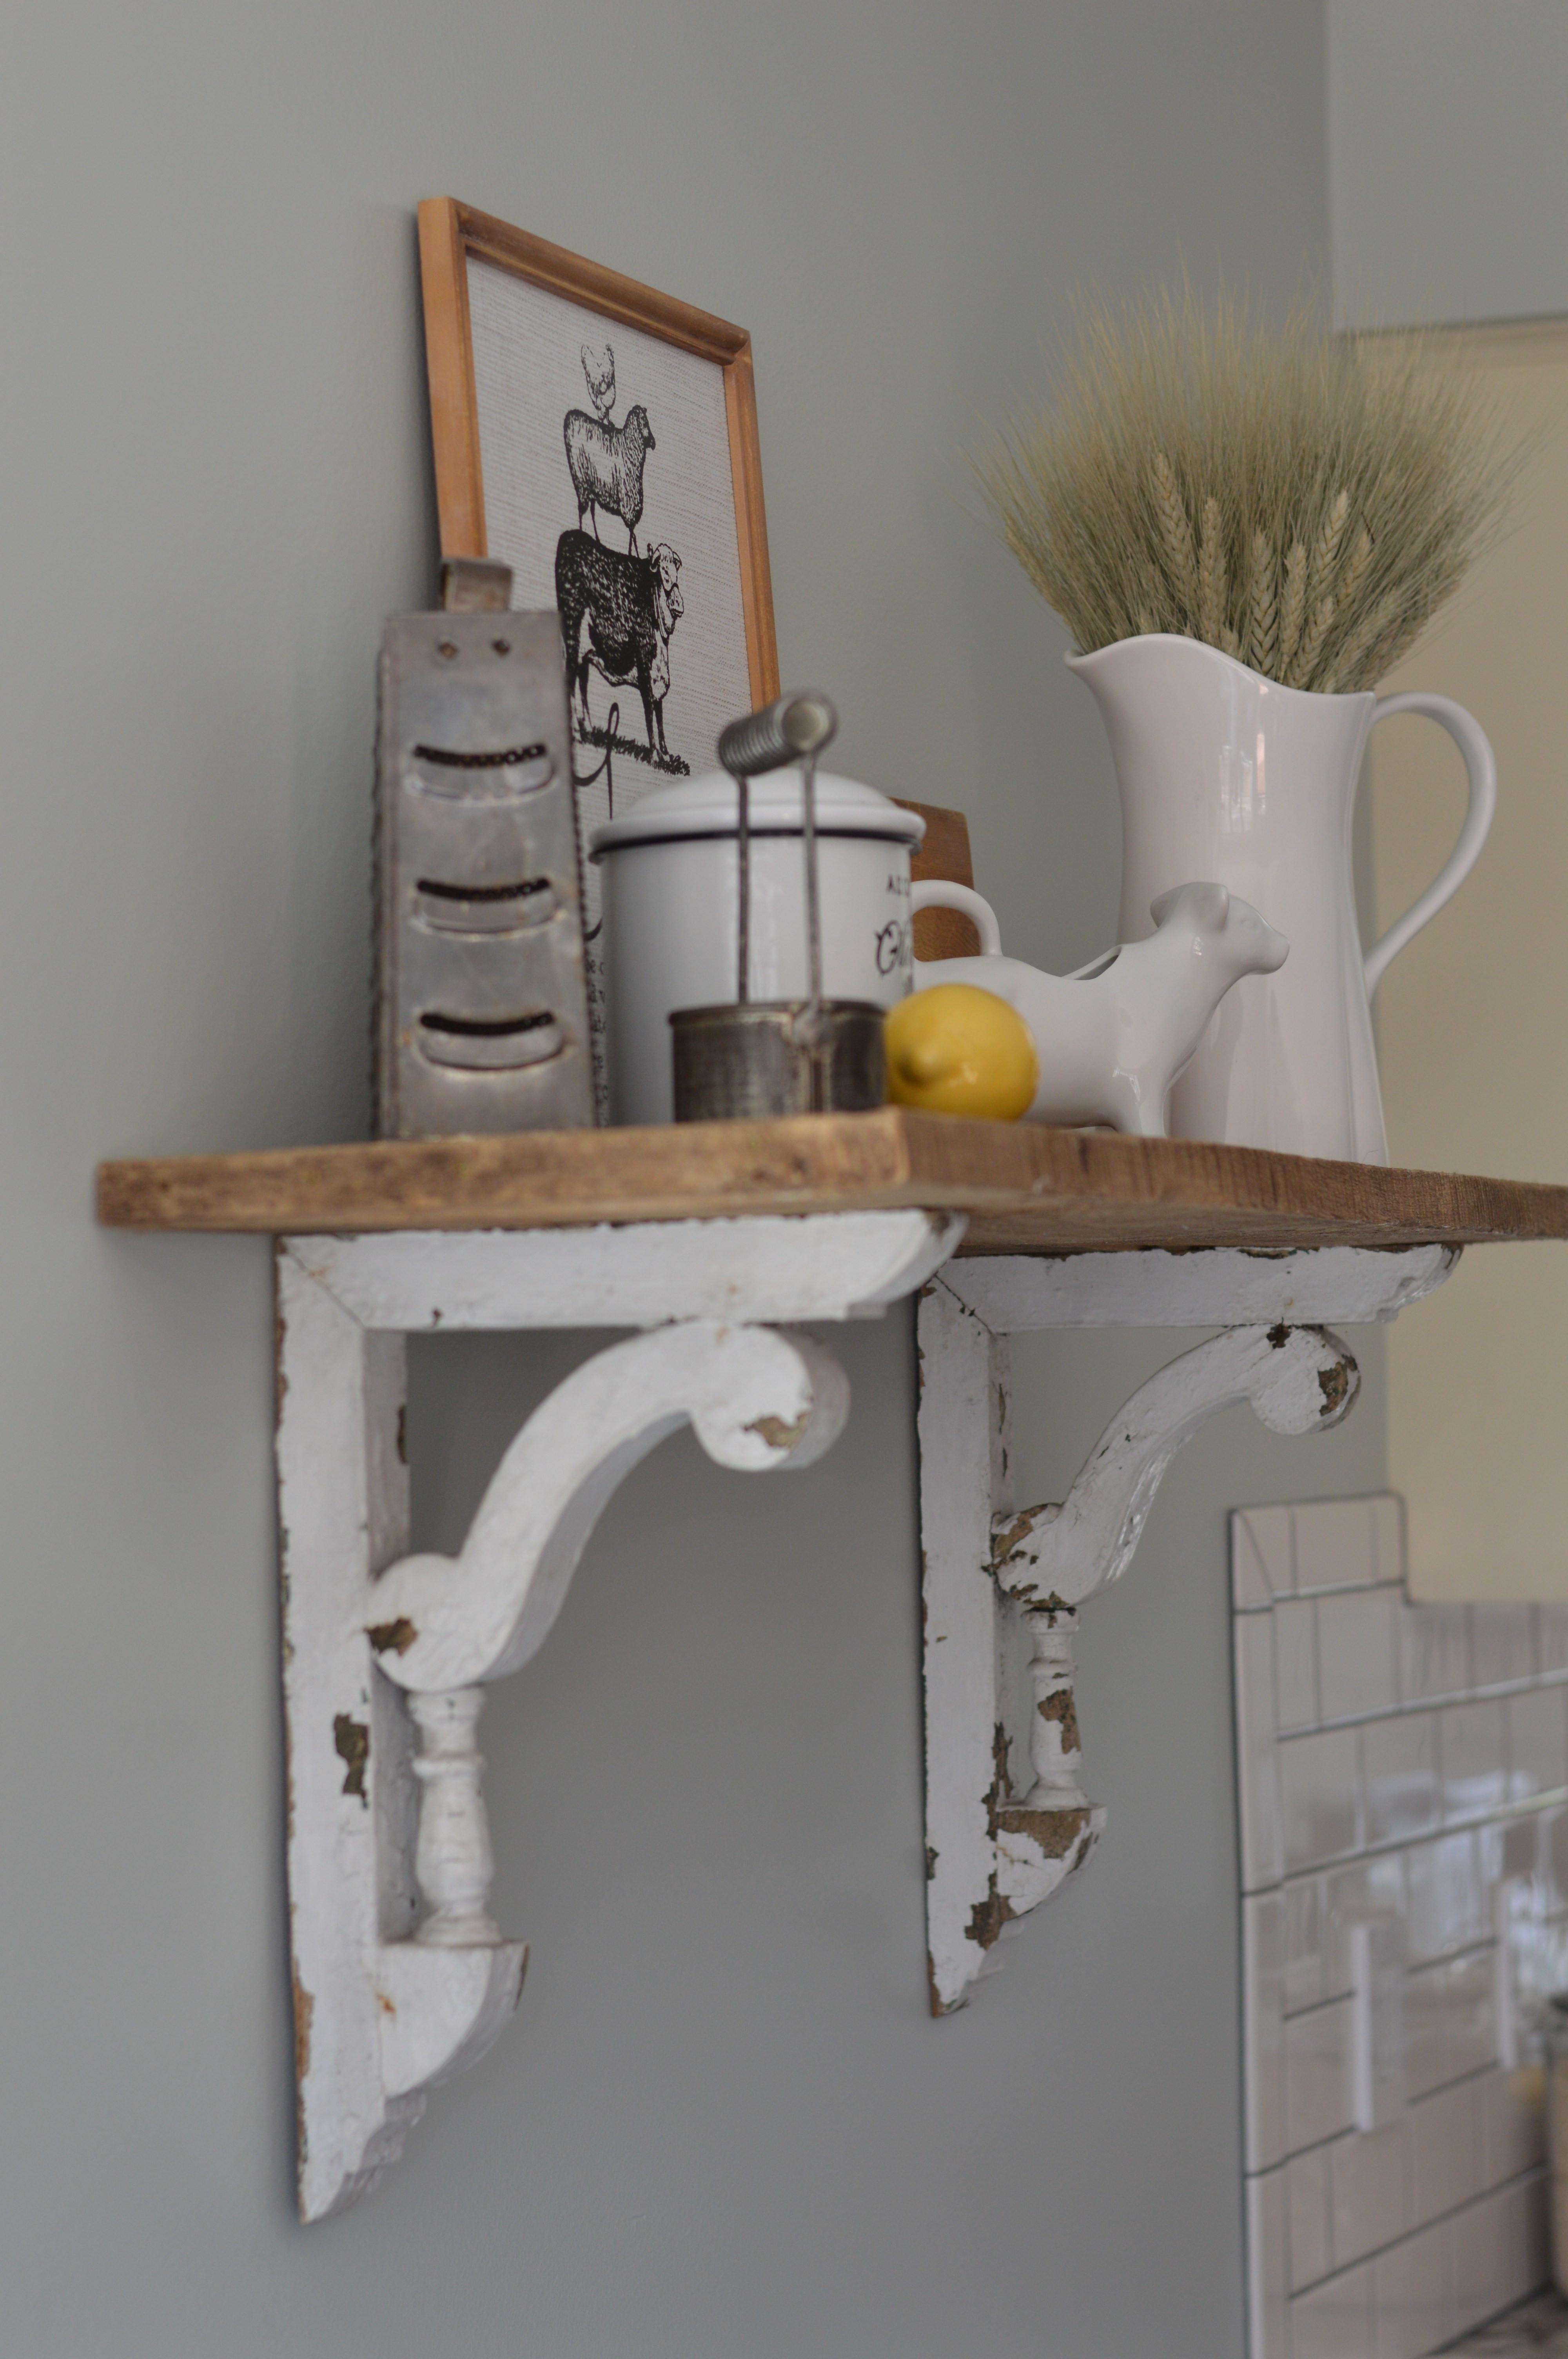 Best ideas about DIY Barn Wood Shelves . Save or Pin DIY Barn Wood Shelf Shabby Grace Now.